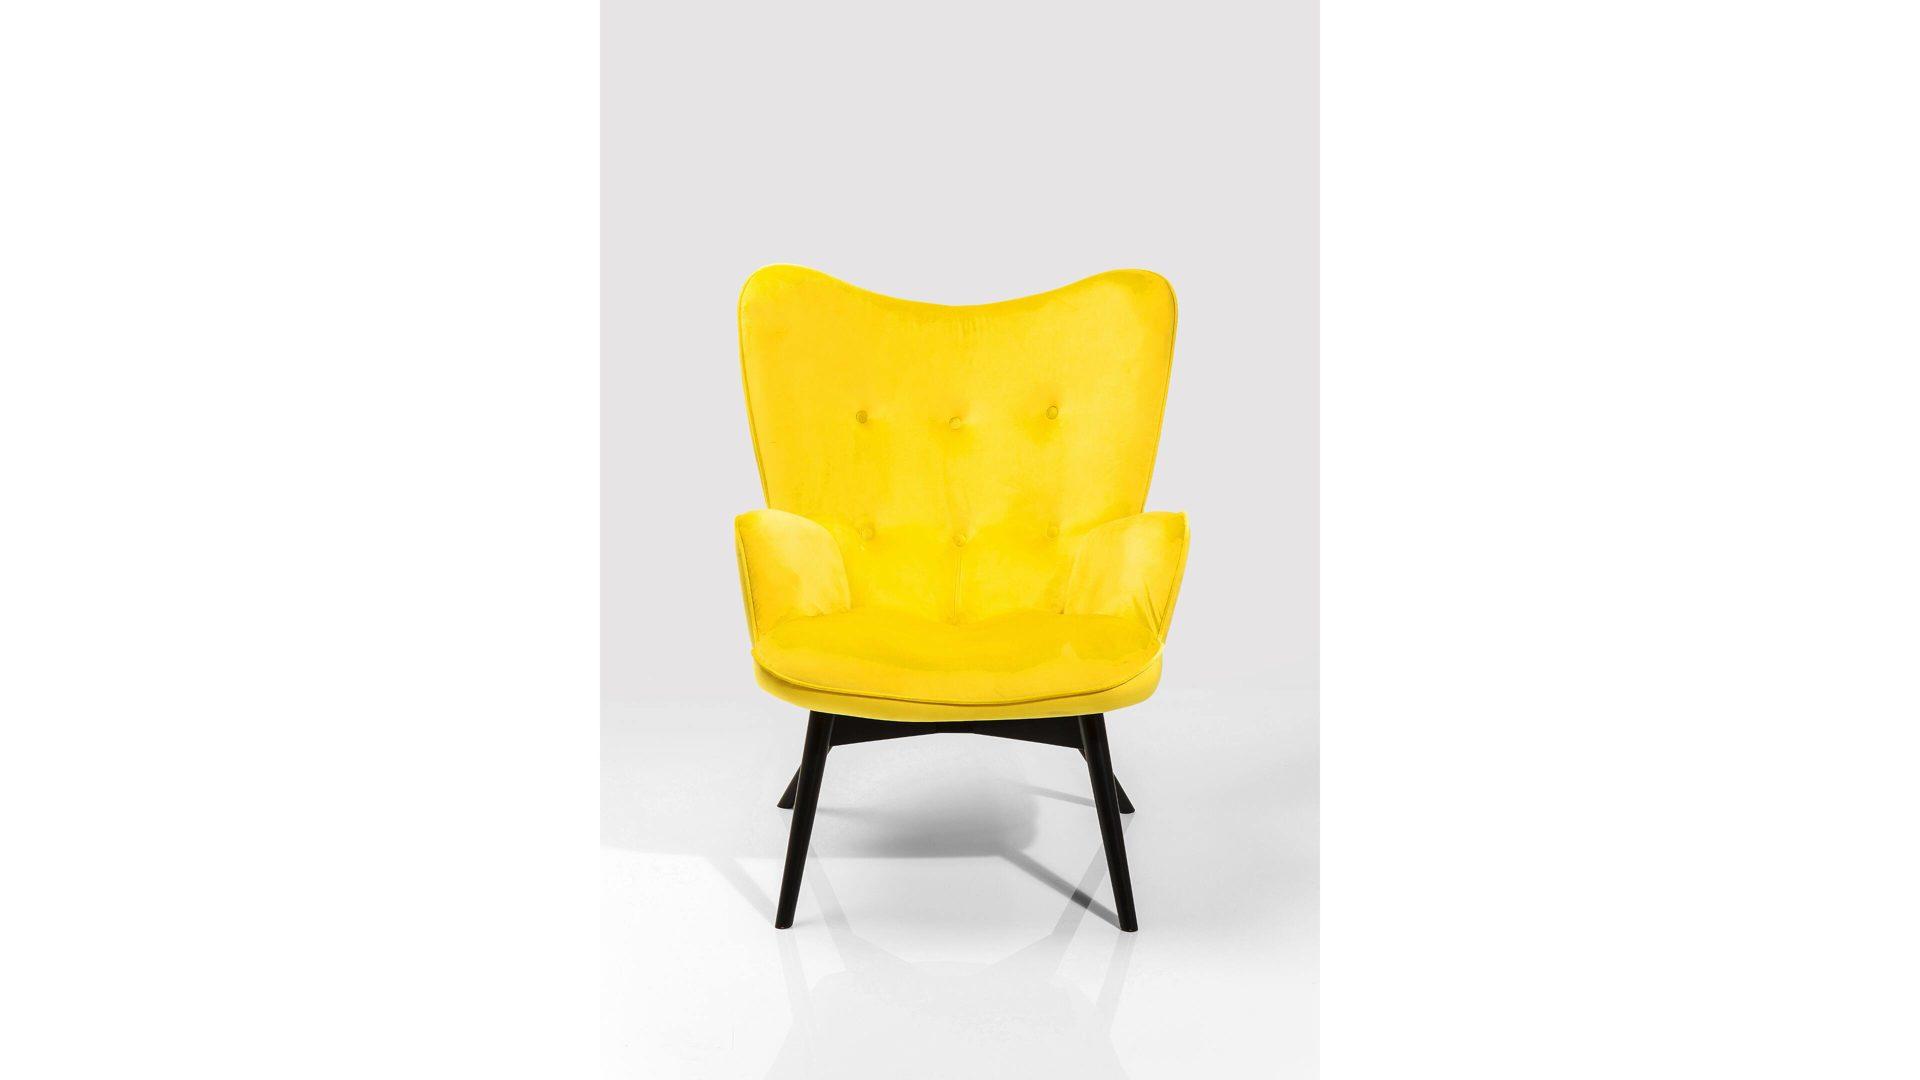 Kare Design Retro Sessel Vicky Gelber Samtbezug Schwarze Holzfüße